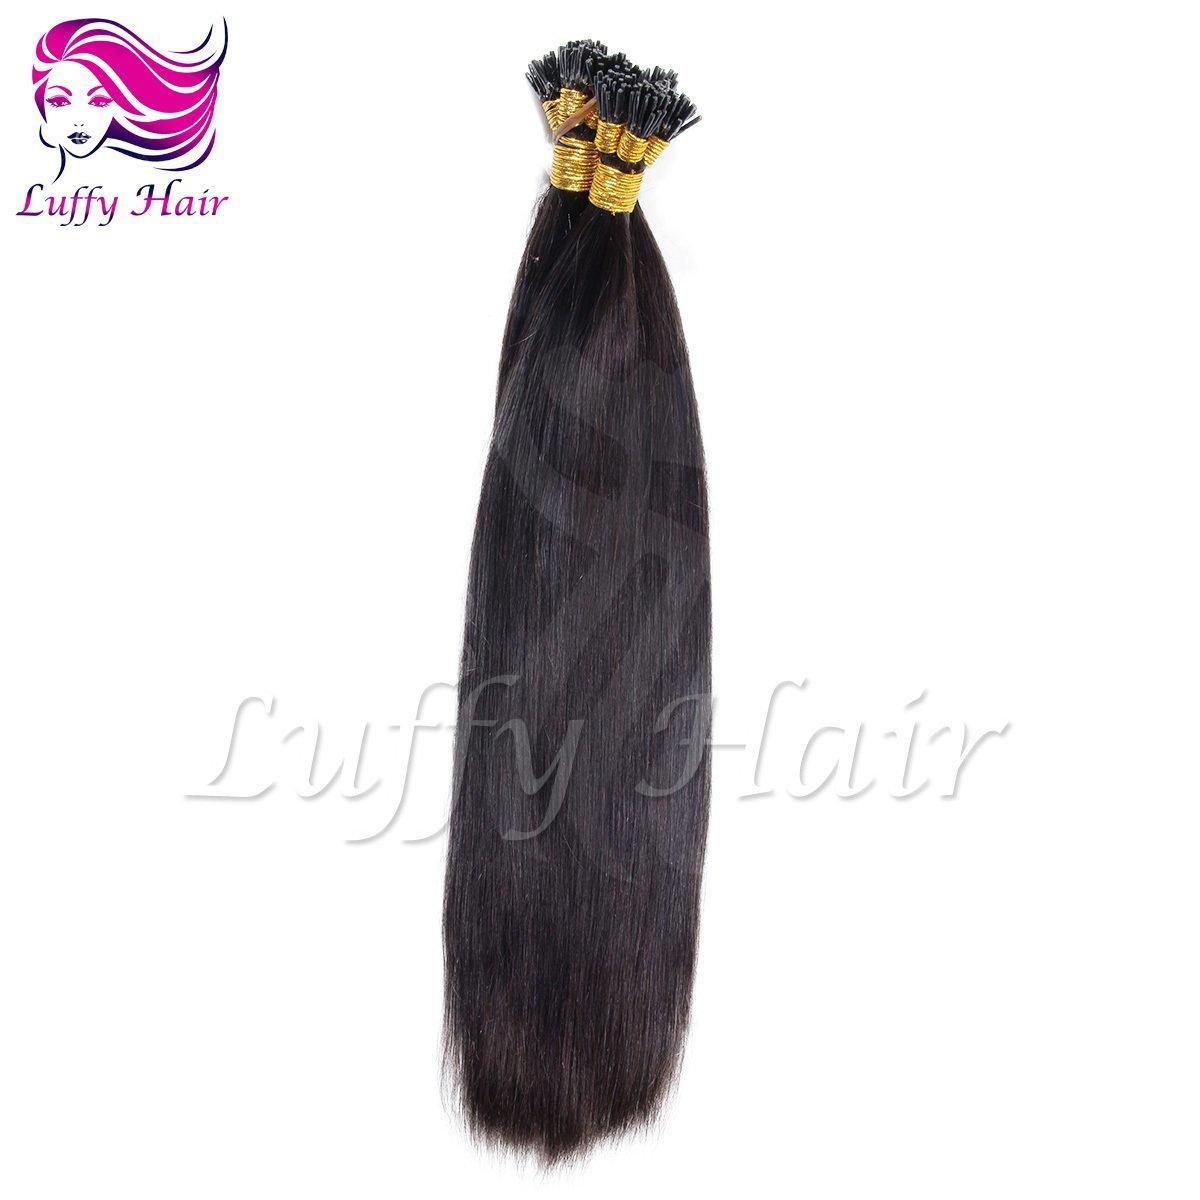 10A Virgin Human Hair Silky Straight Fusion Hair Extensions - KFL004